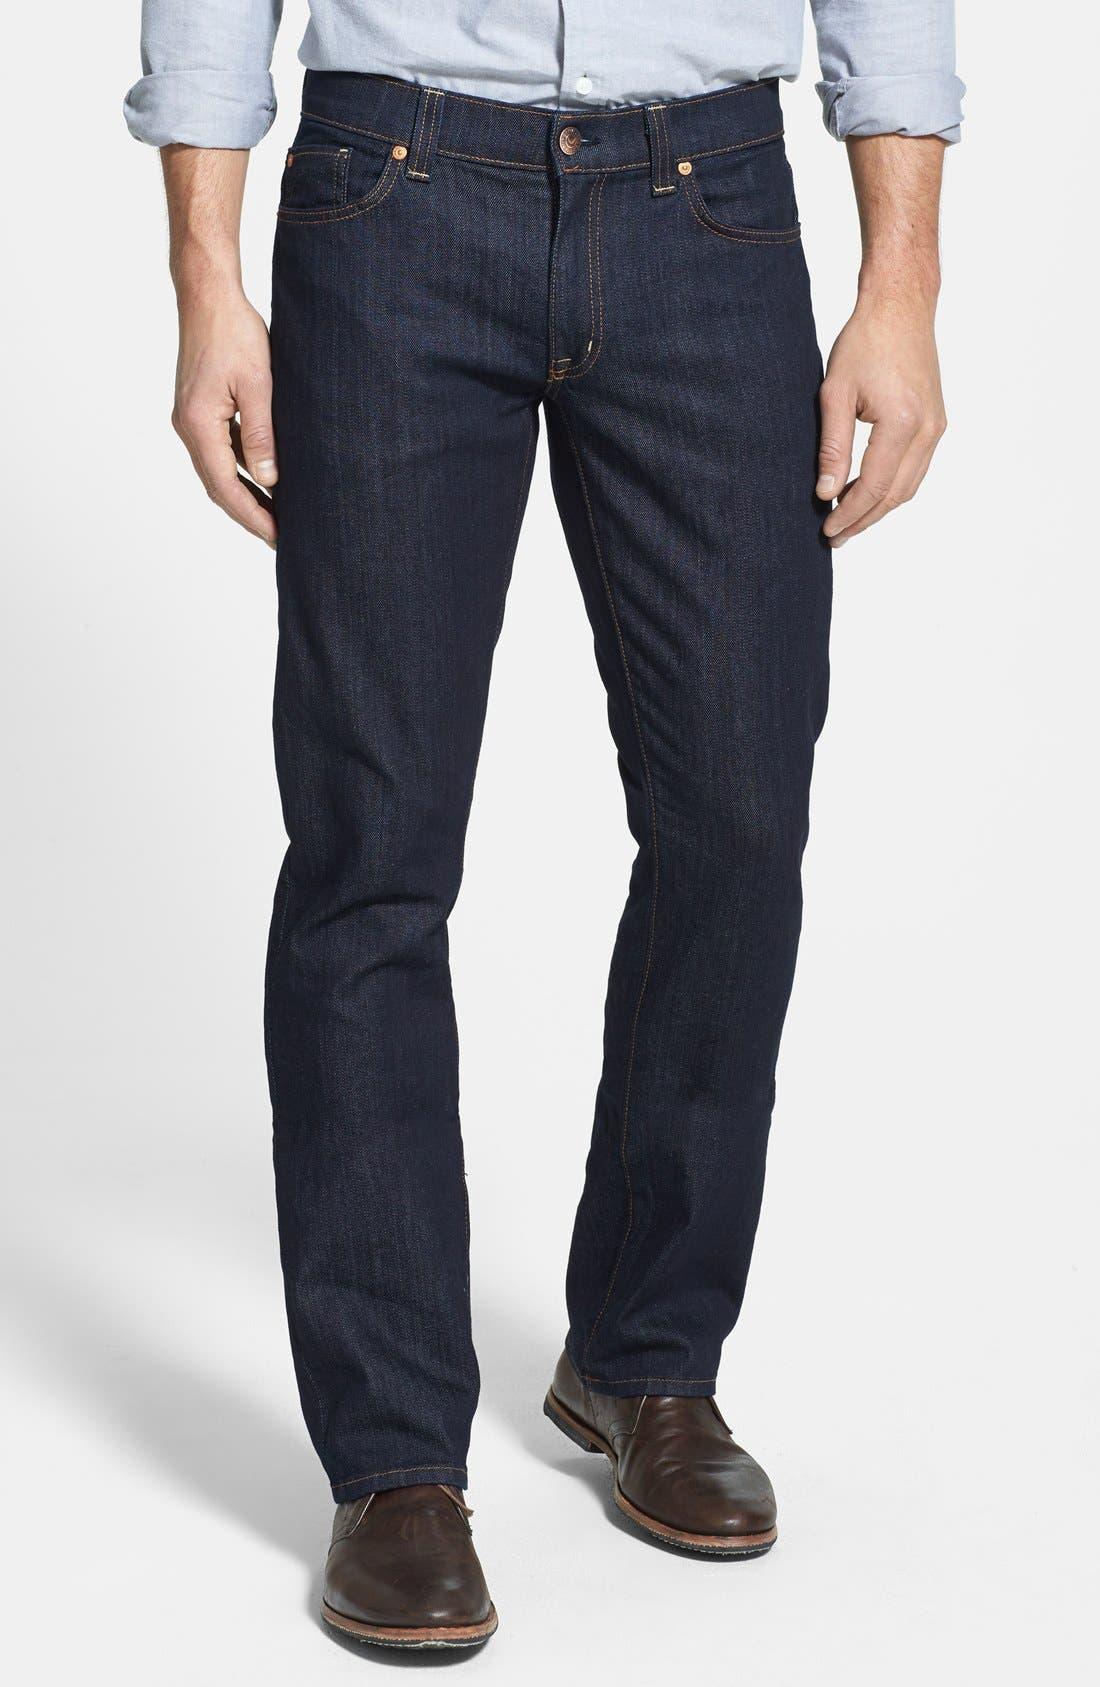 Main Image - Fidelity Denim 'Impala' Straight Leg Jeans (Town Rinse)